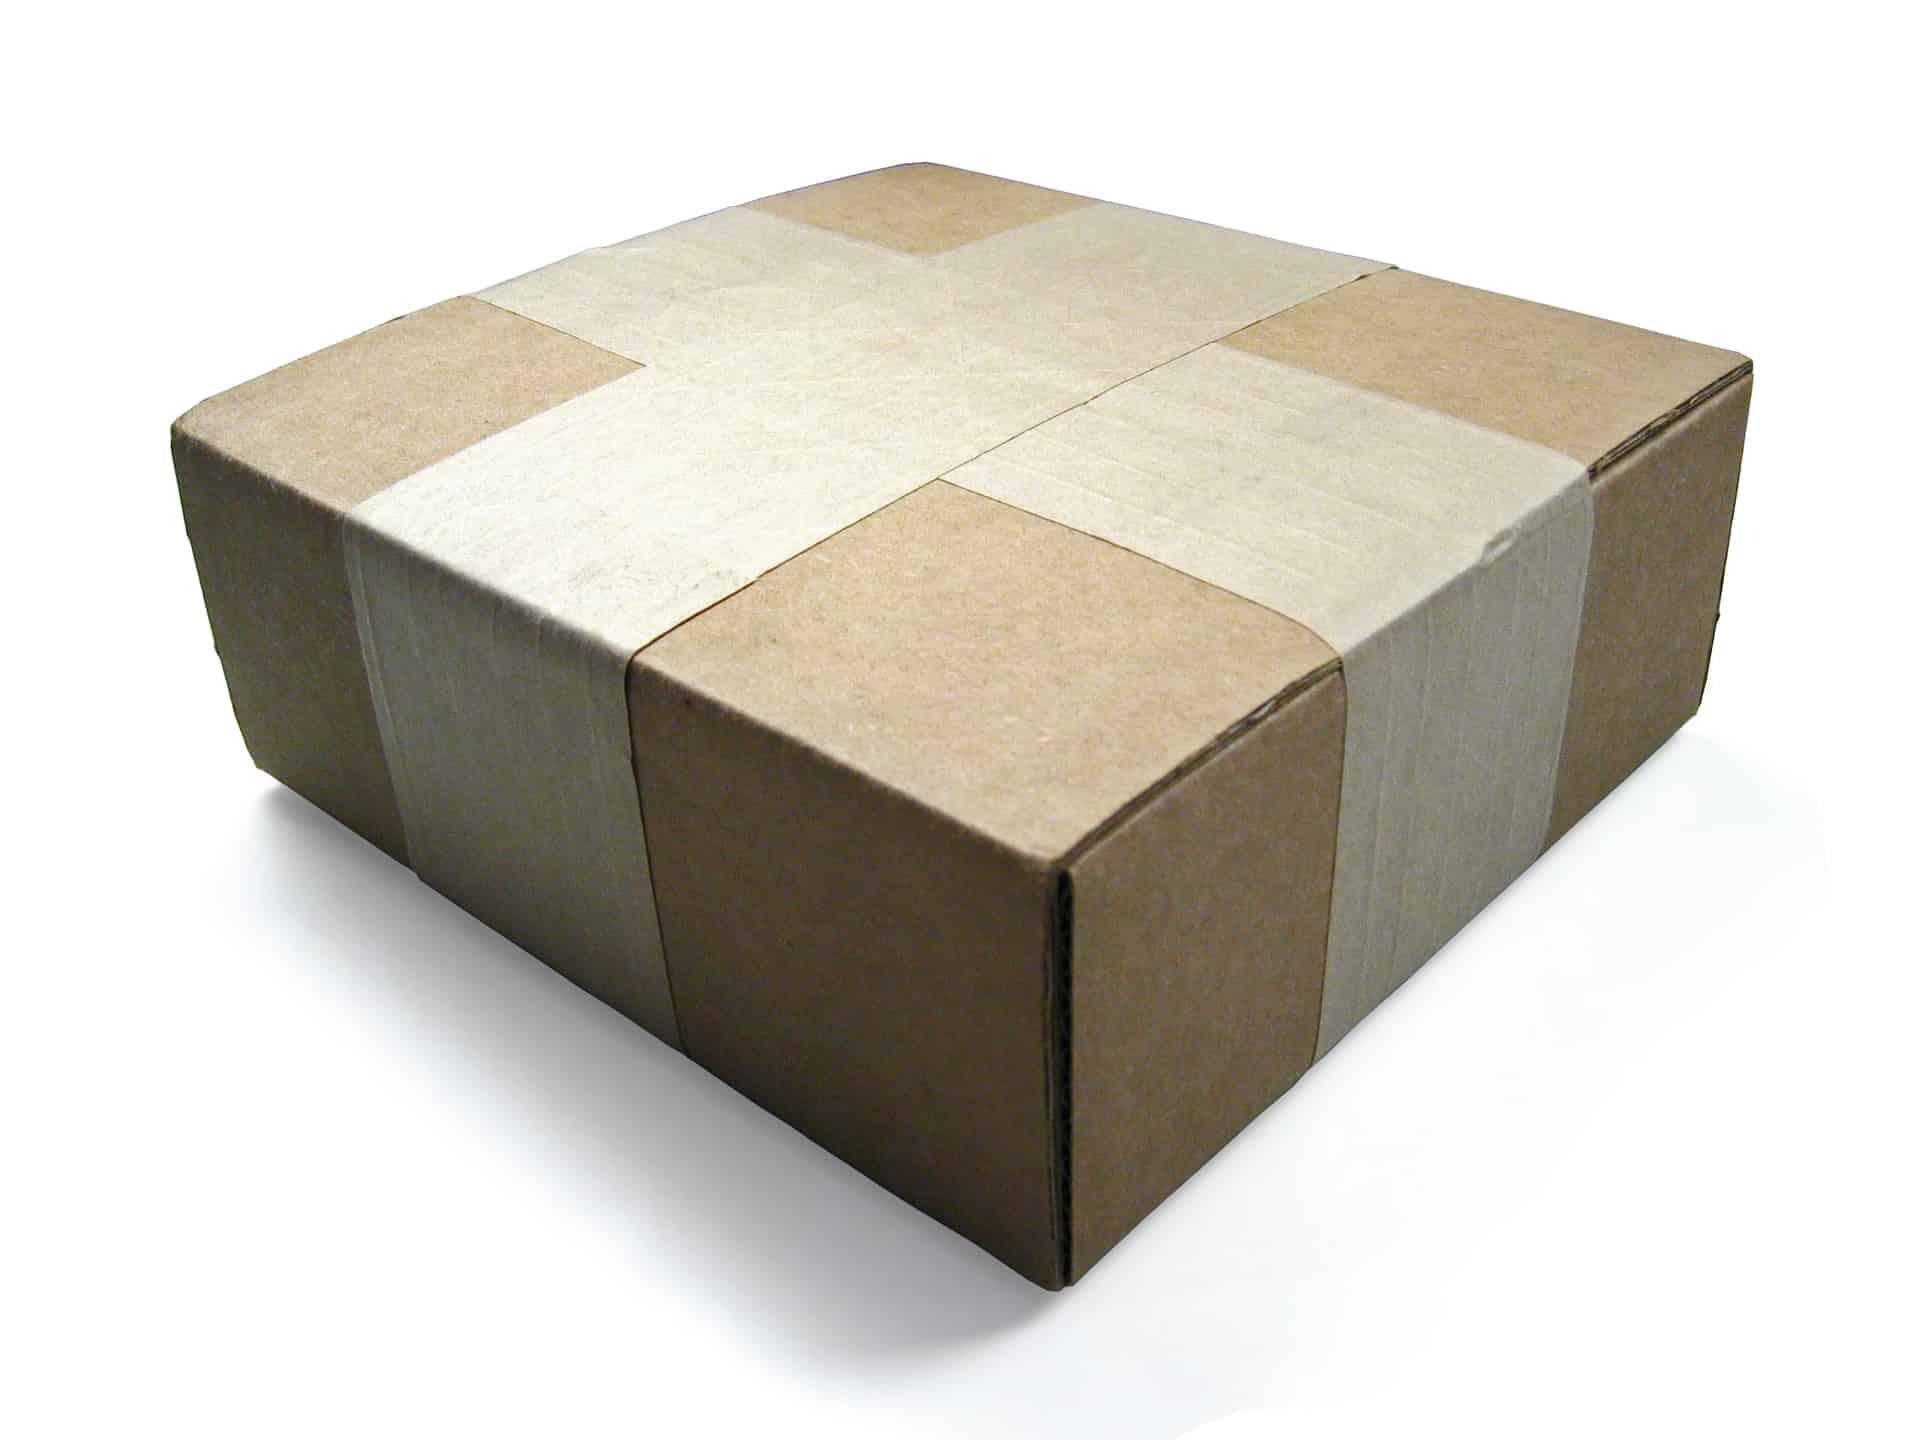 Verpackung aus Karton